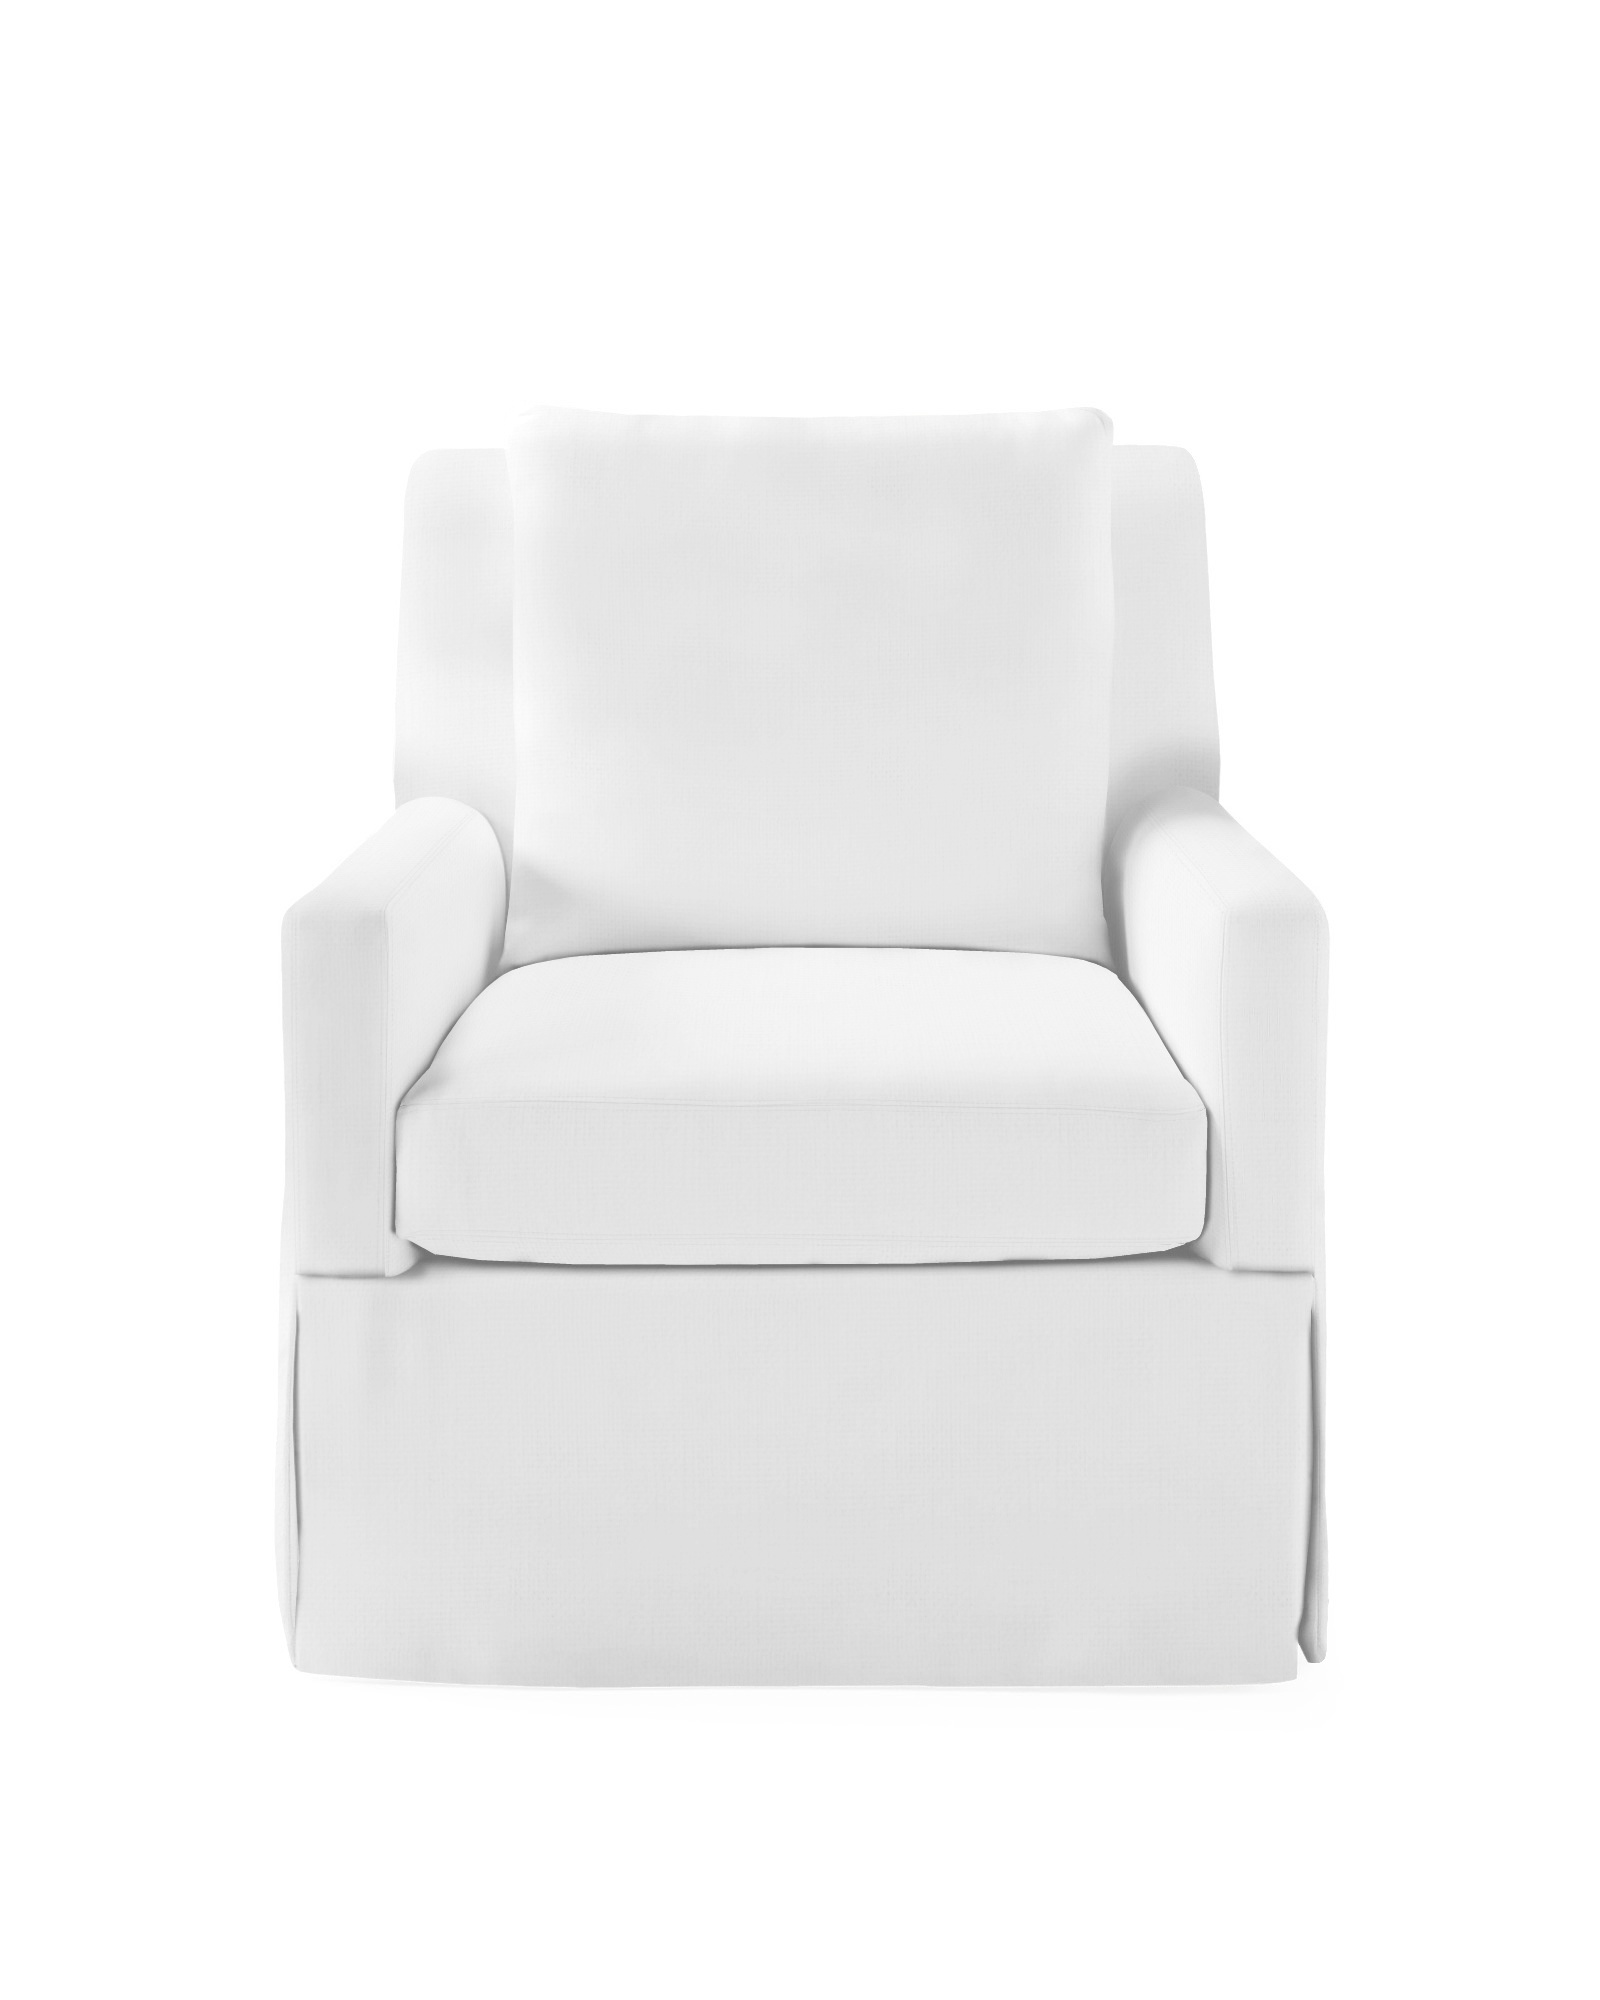 Jamieson Swivel Chair - Slipcovered